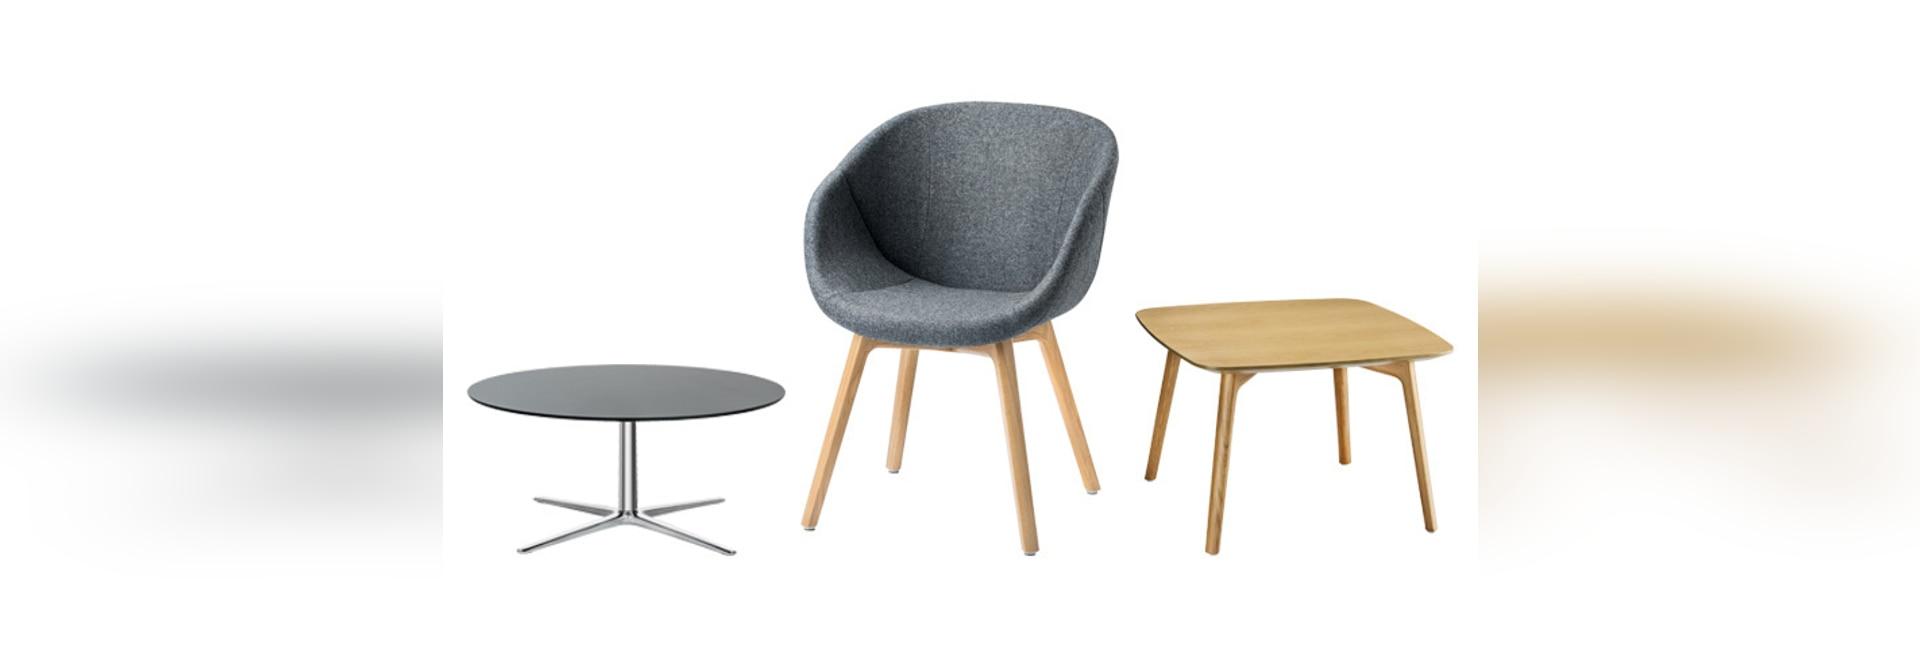 LIMUN Coffeetable, GRAND CHAIR WOOD, GRAND Coffeetable